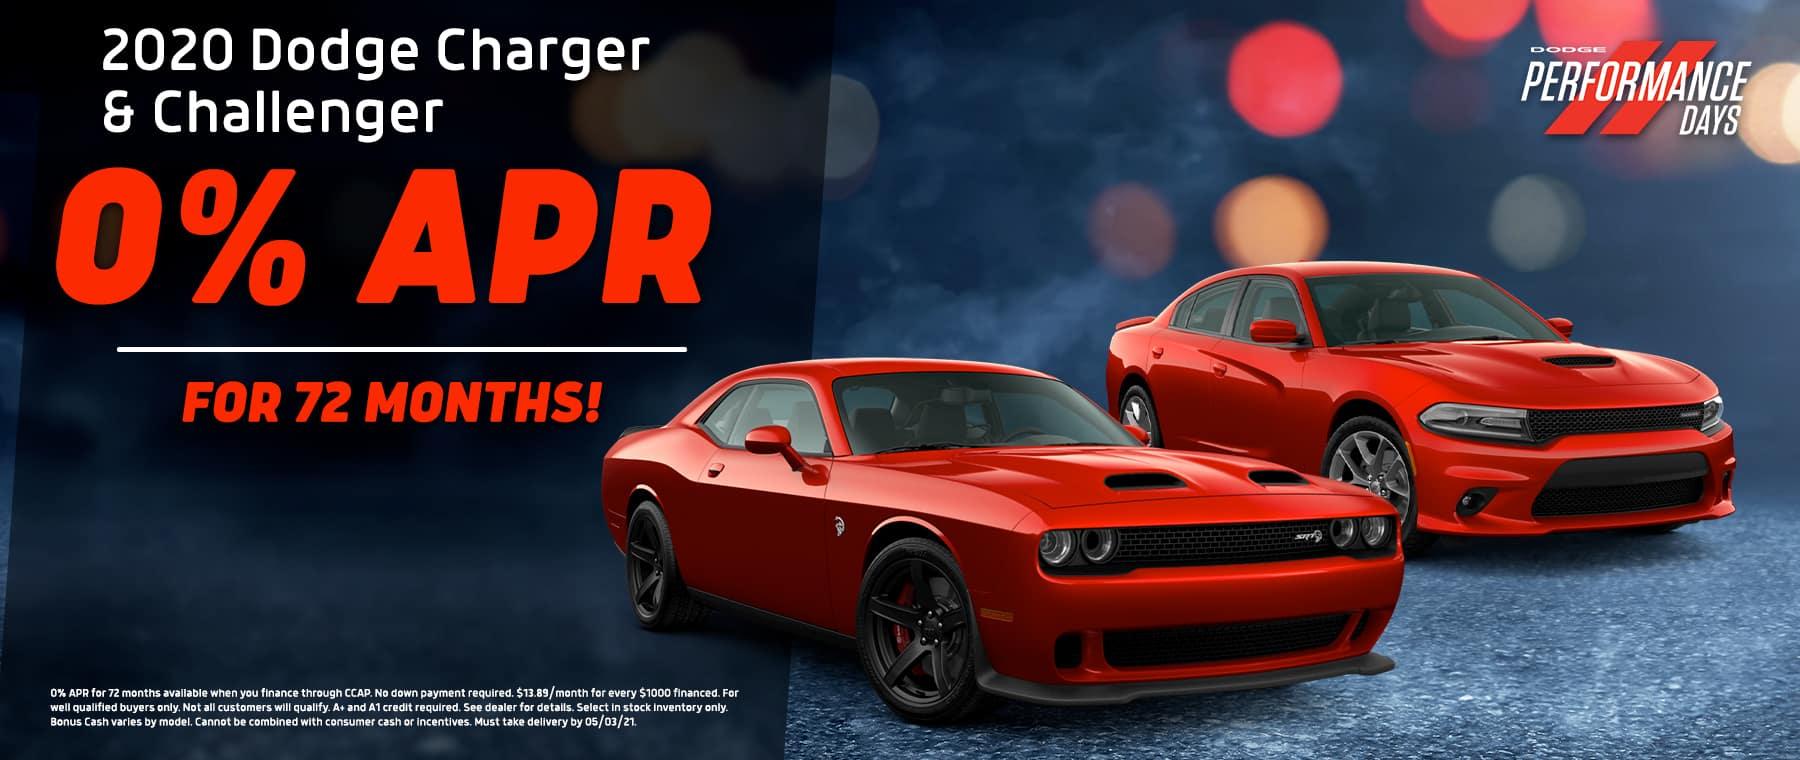 Hendrick-Dodge-RAM-Fiat-Cary-Apri21_TR_Website-Assets-charger_challenger-1800×760